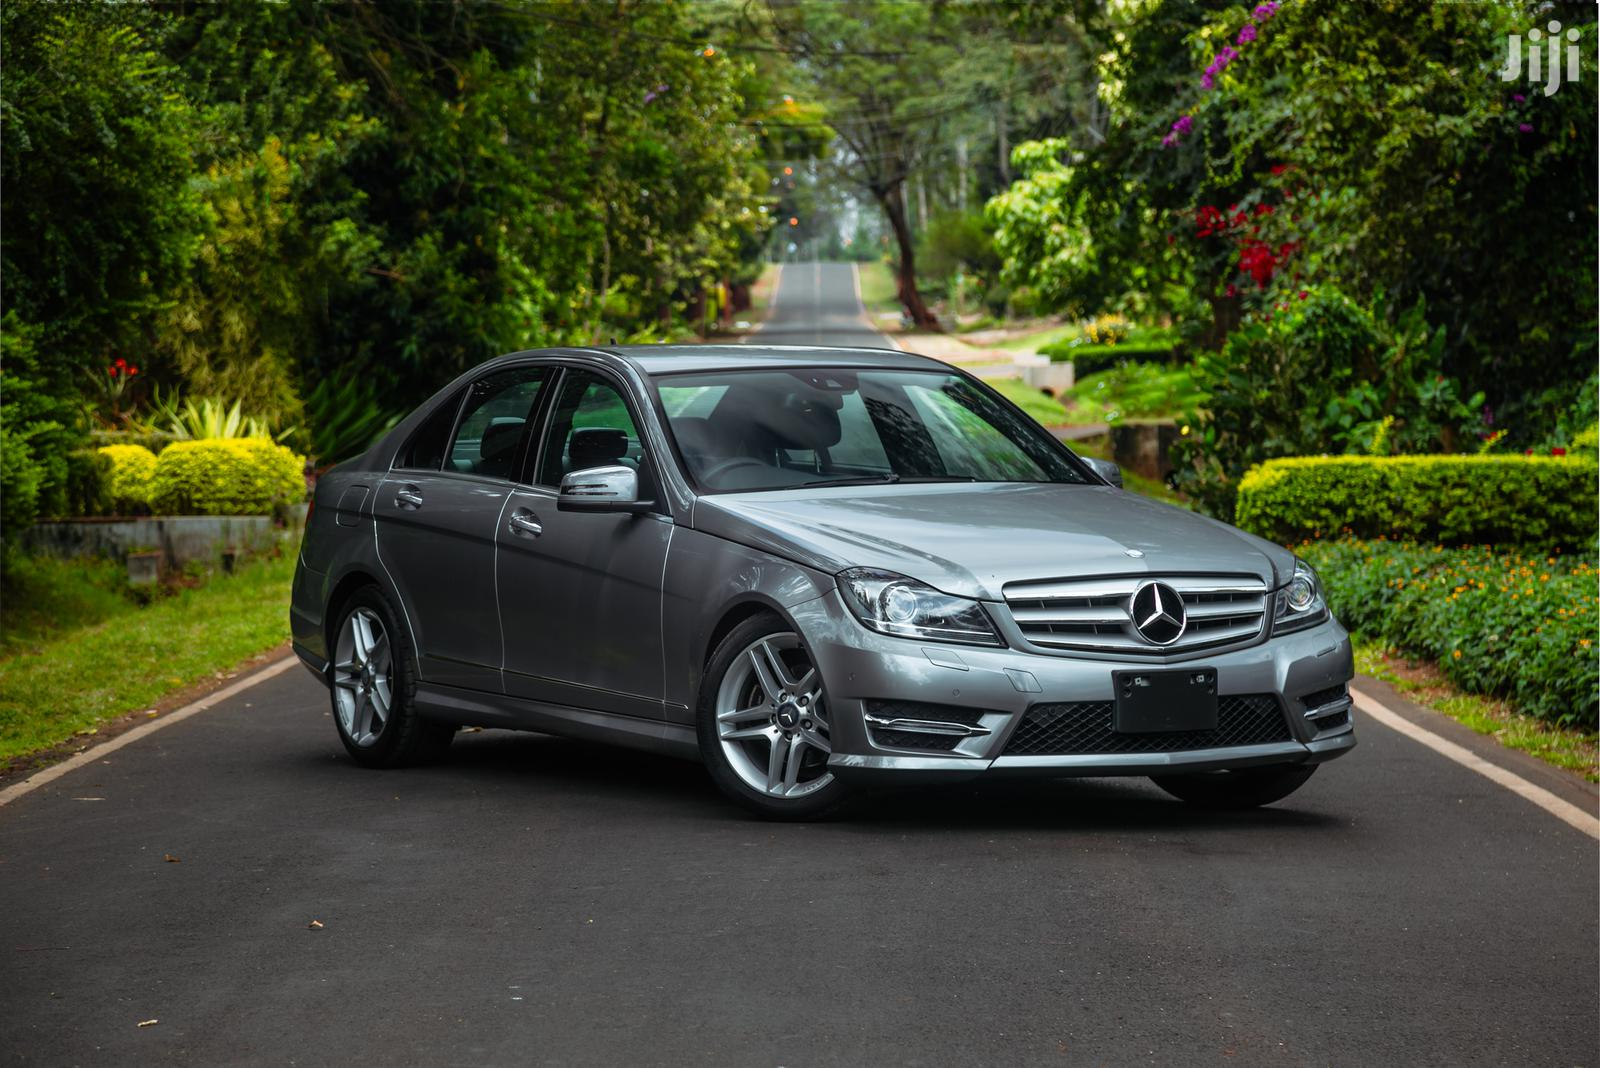 Mercedes-Benz C200 2013 Gray